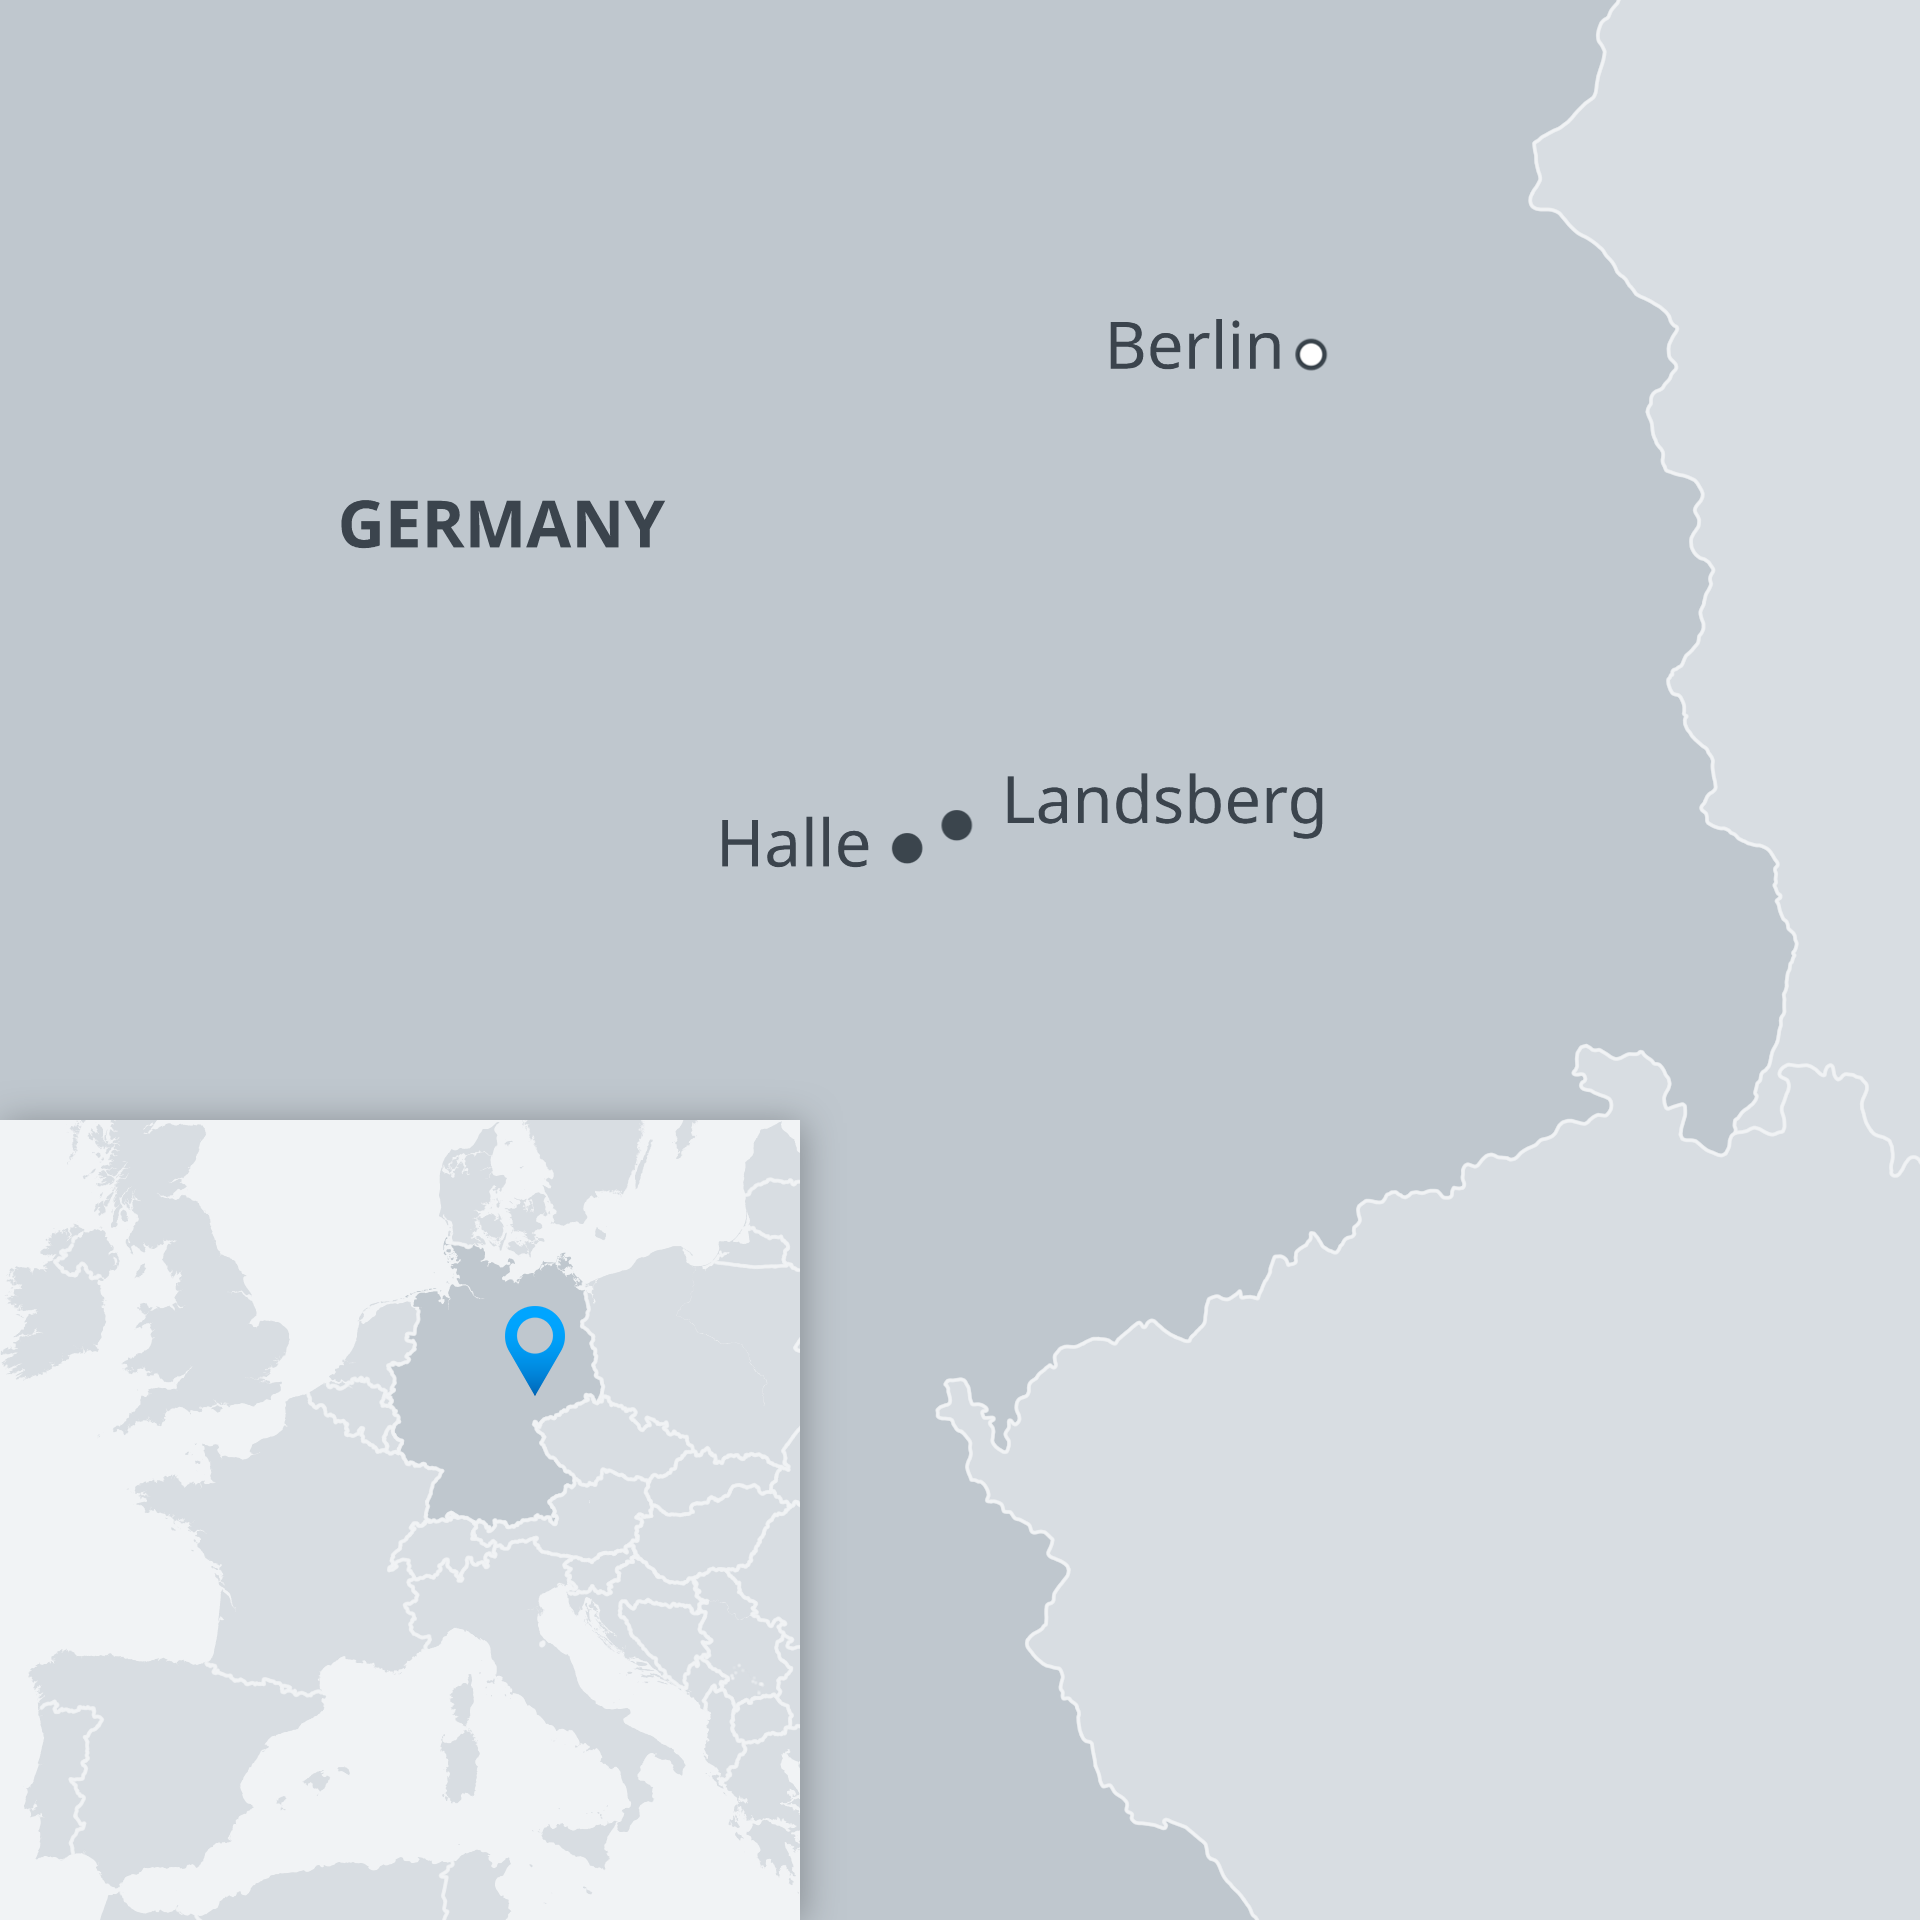 Karte Halle und Landsberg EN